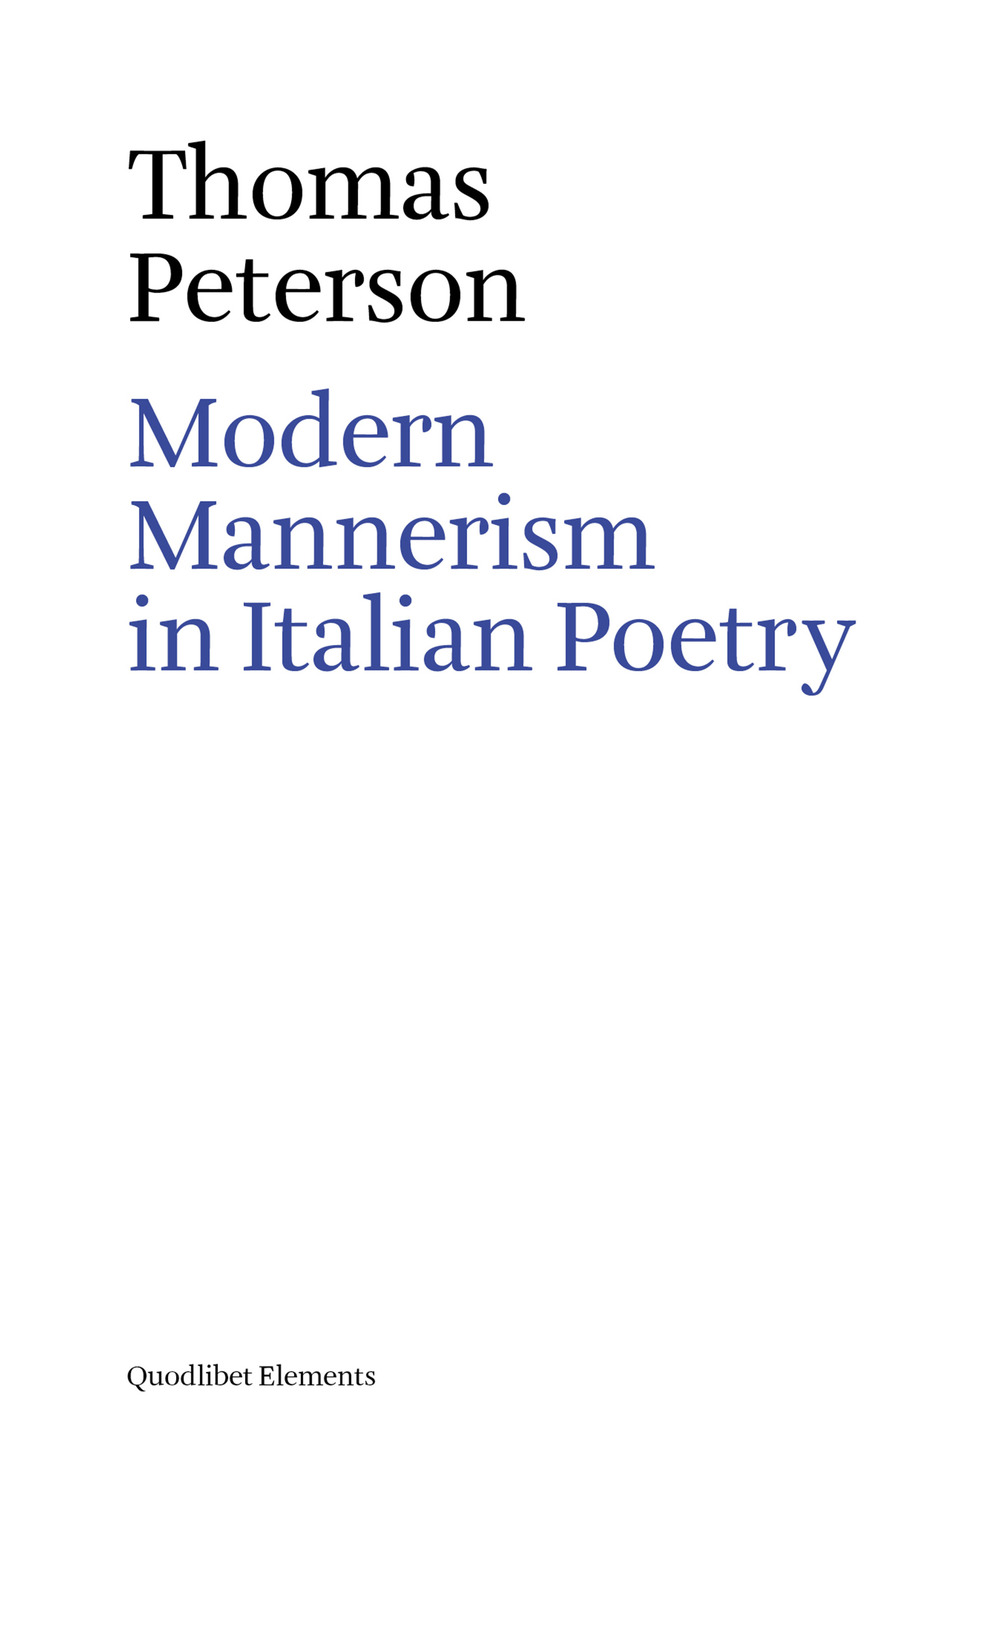 MODERN MANNERISM IN ITALIAN POETRY - 9788822900715